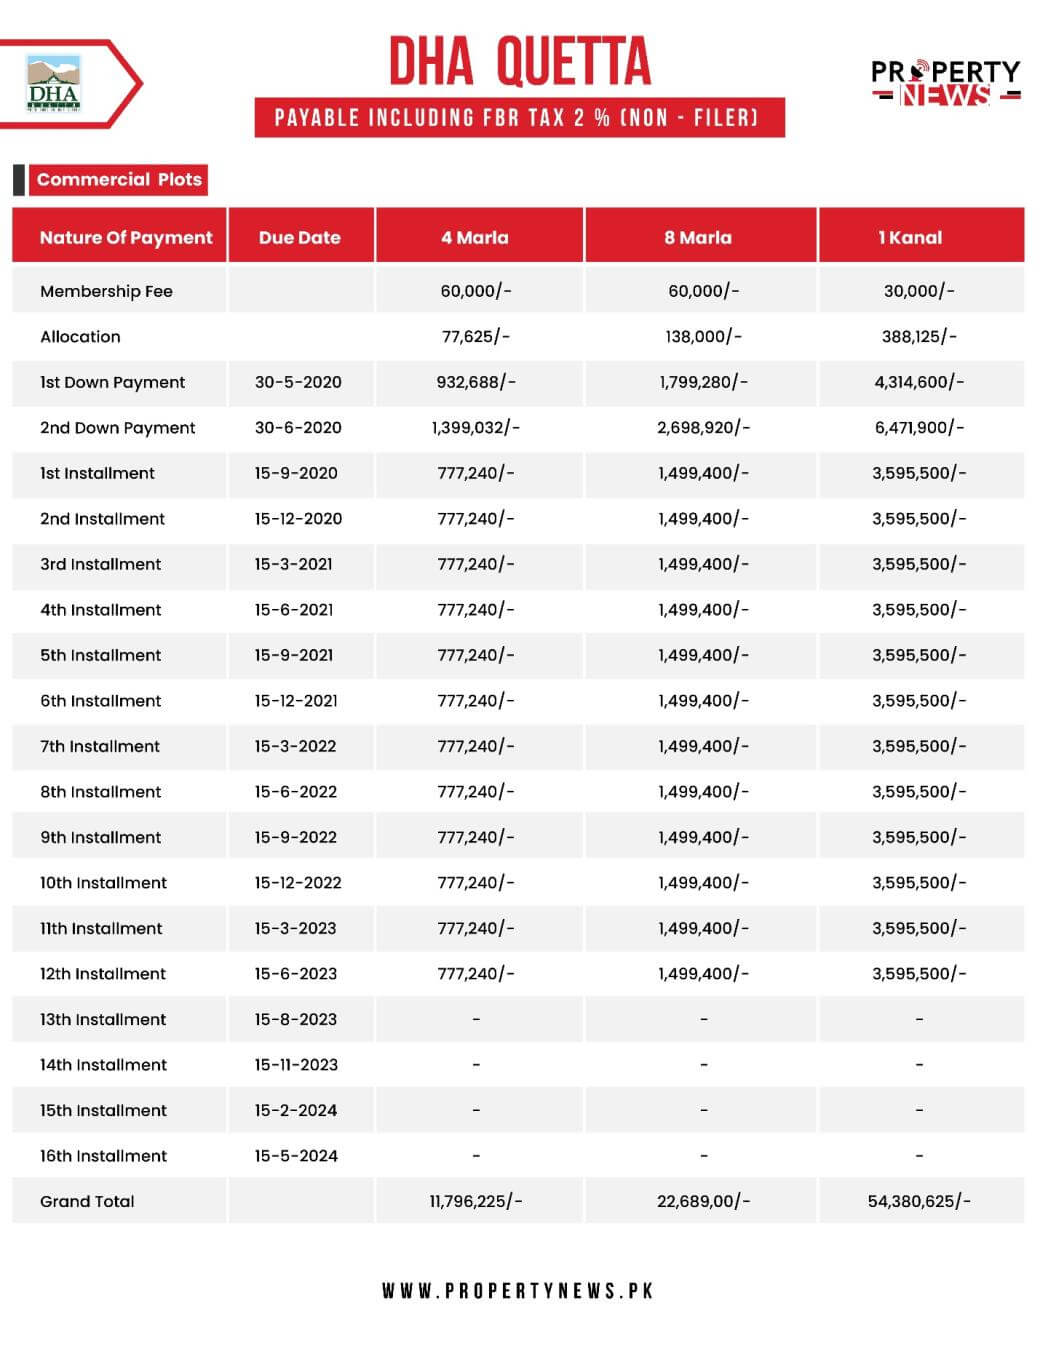 DHA Quetta Commercial Plots Installment Plan FBR Tax2% (Non-Filer)